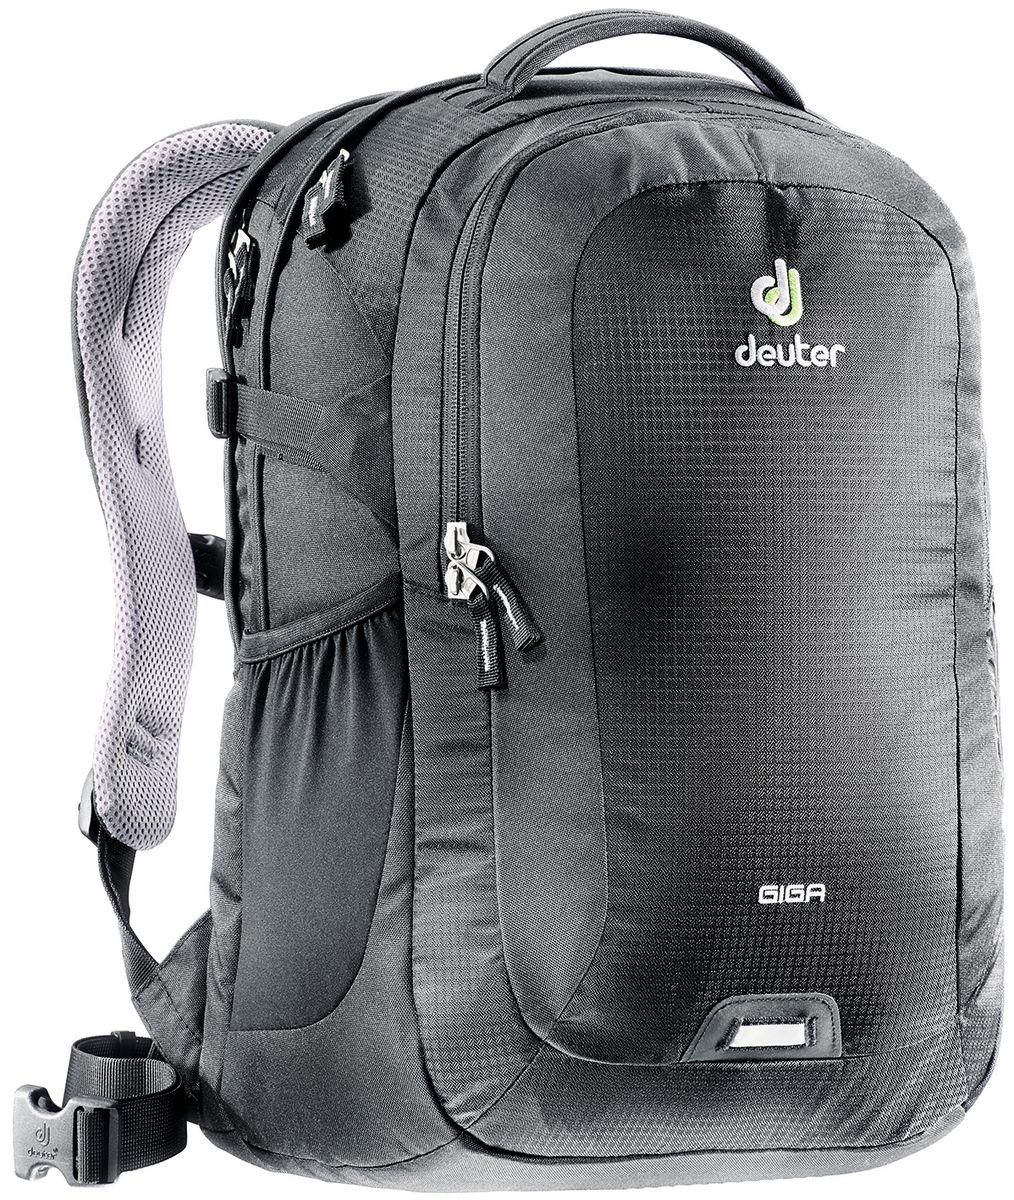 Рюкзак Deuter Daypacks Giga, цвет: черный, 28 л рюкзак deuter daypacks giga pro midnight dresscode